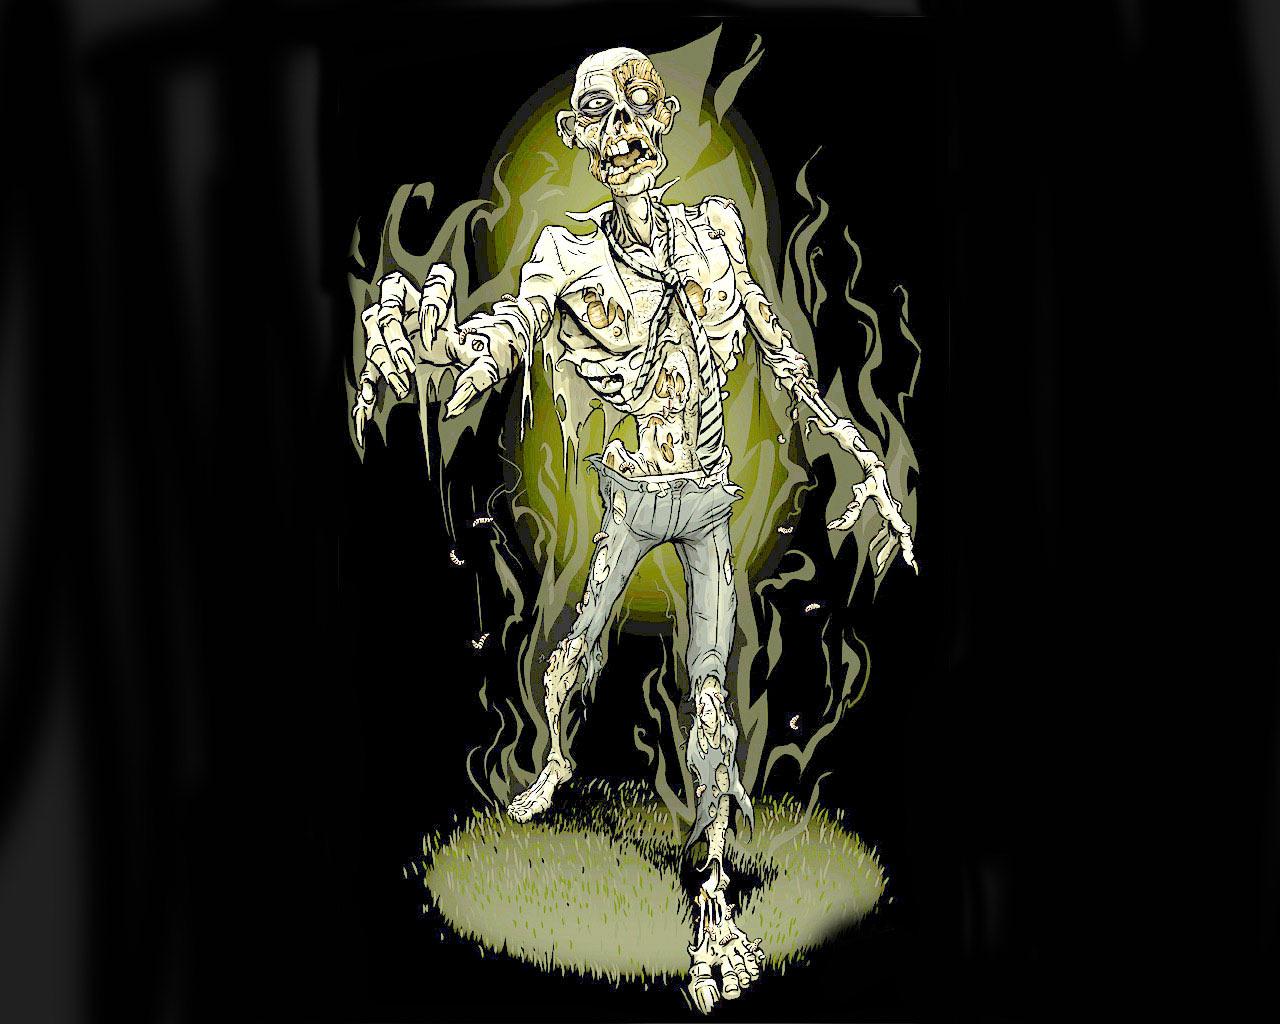 http://4.bp.blogspot.com/-KQtjd4JUyEk/TjyUO4tWYLI/AAAAAAAAAfc/MXrA4QCQcfI/s1600/Zombie.jpg